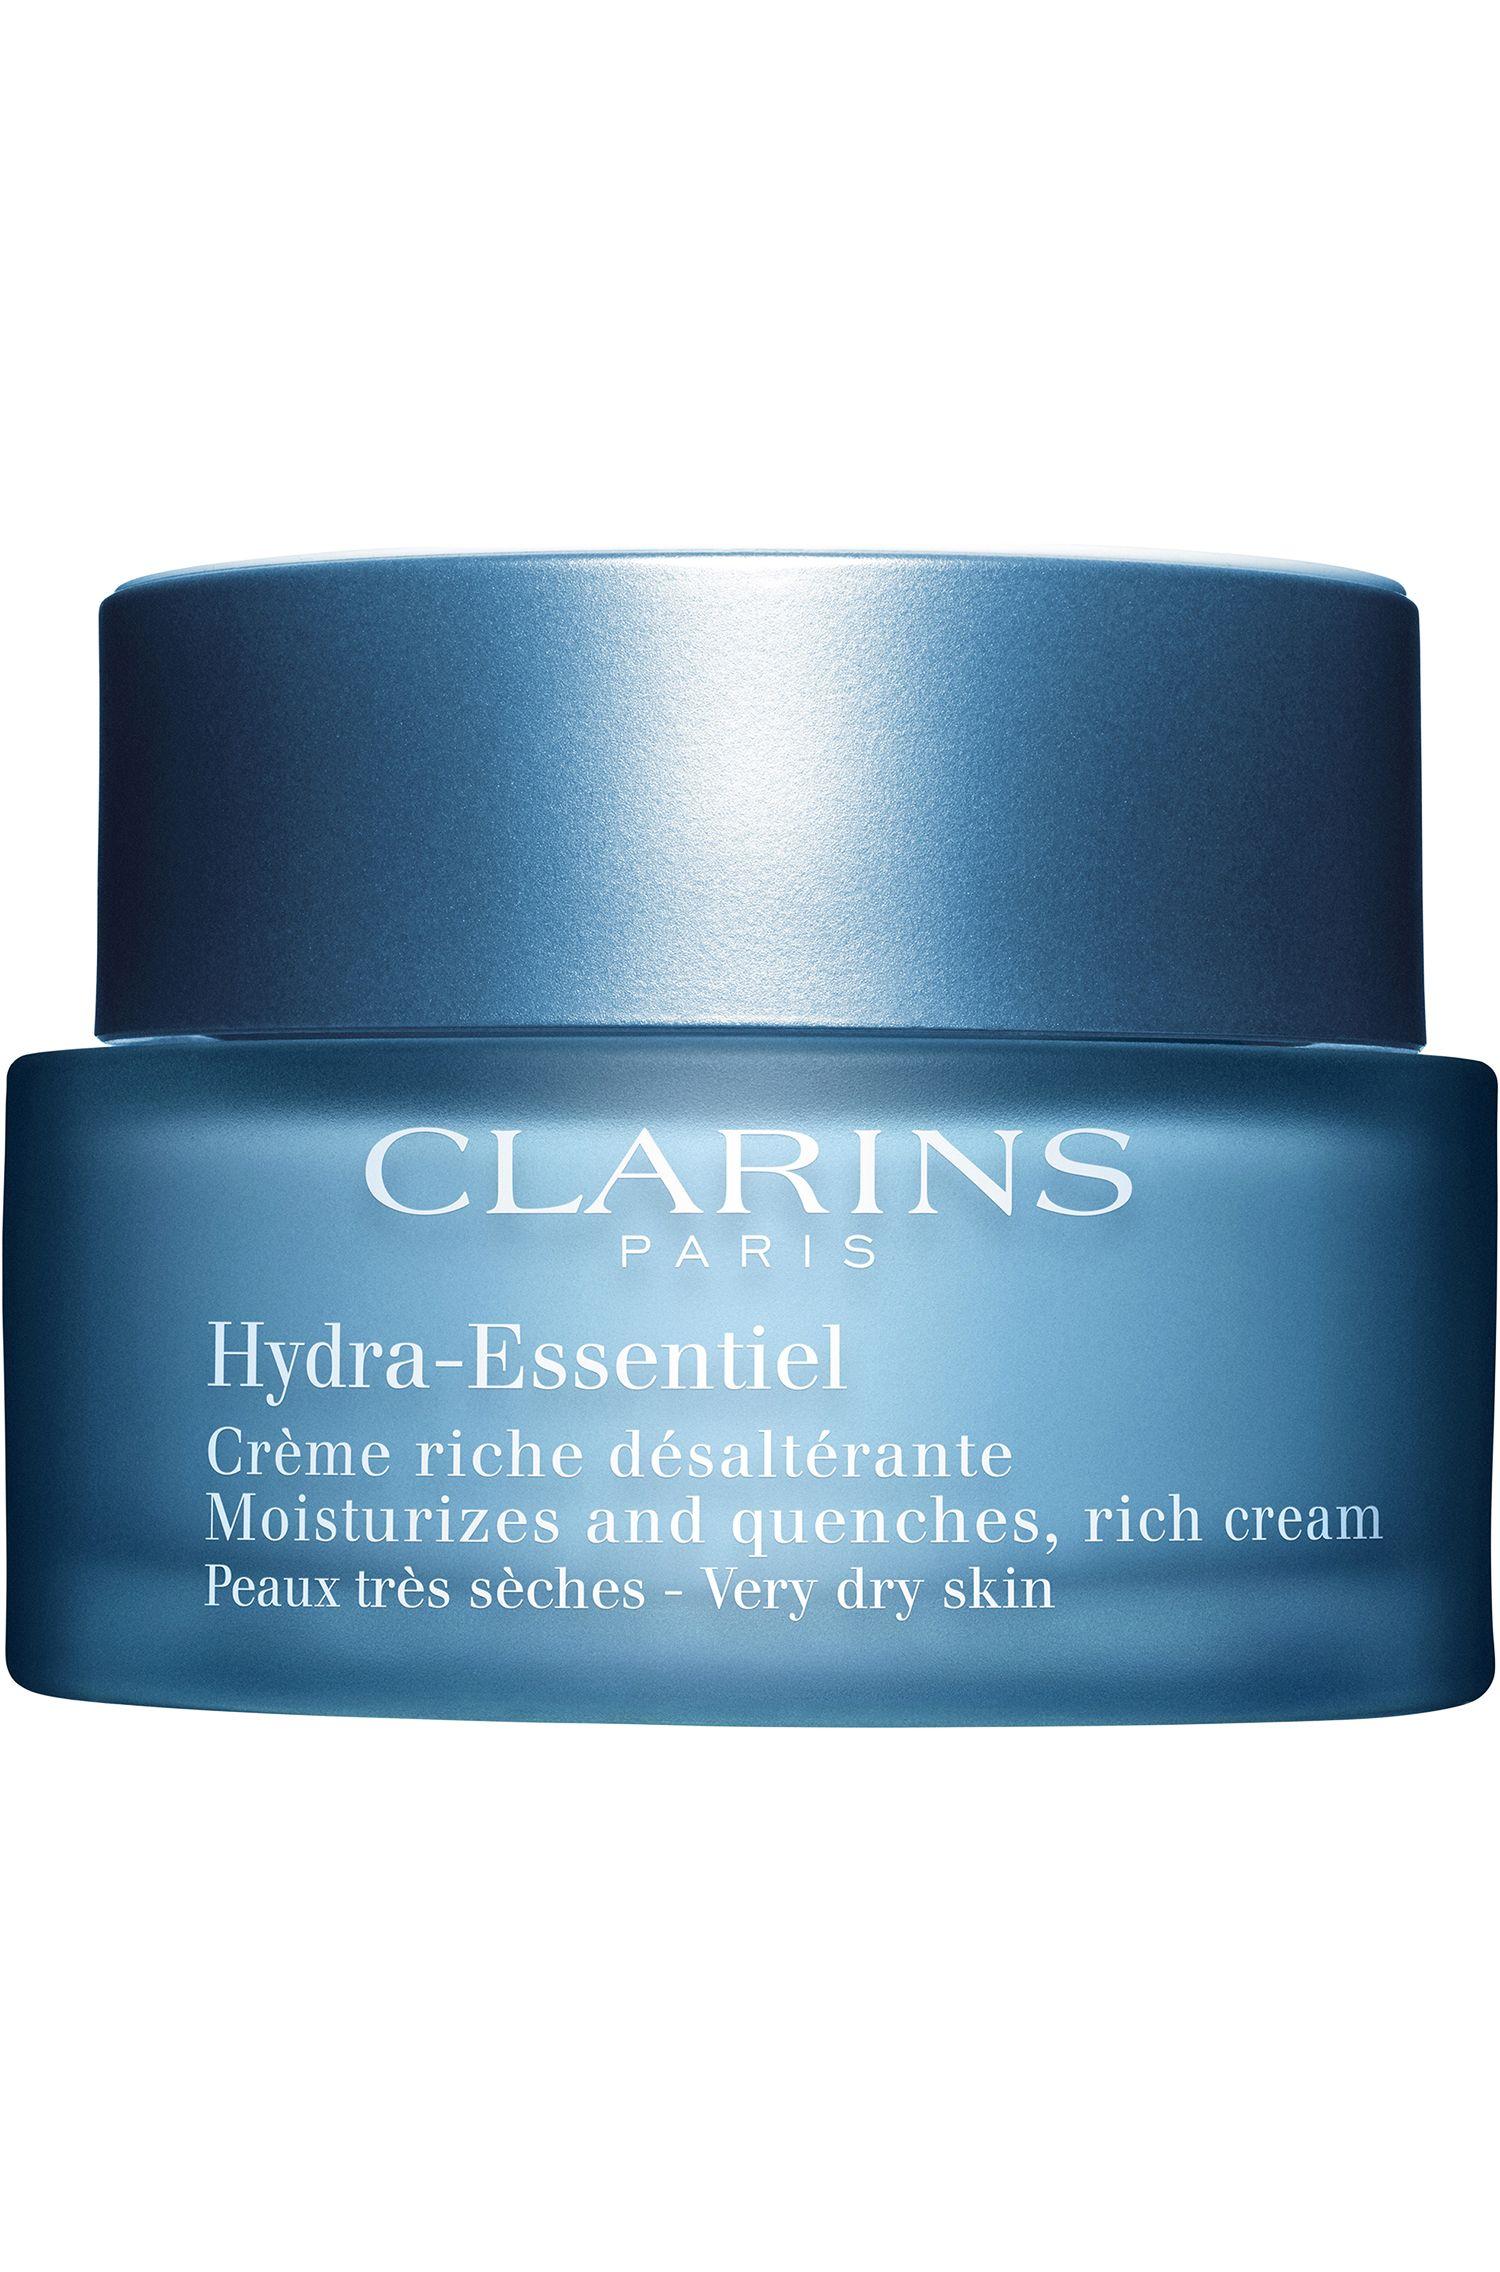 Blissim : Clarins - Crème riche hydratante Hydra-Essentiel peaux sèches - Crème riche hydratante Hydra-Essentiel peaux sèches